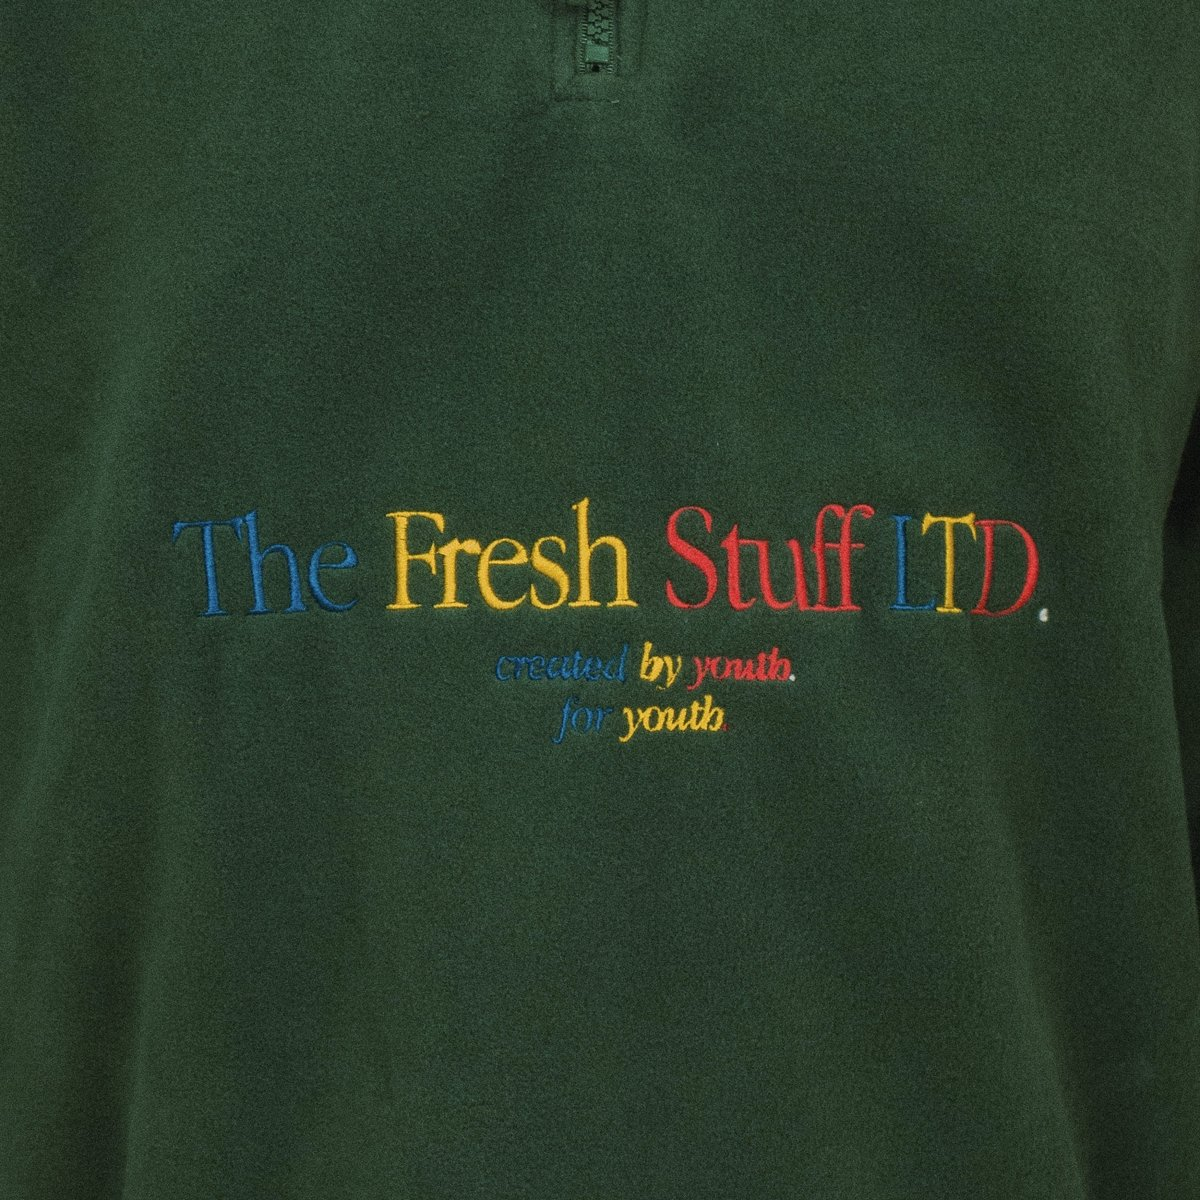 The Fresh Stuff LTD Unisex Embroidered Green Fleece